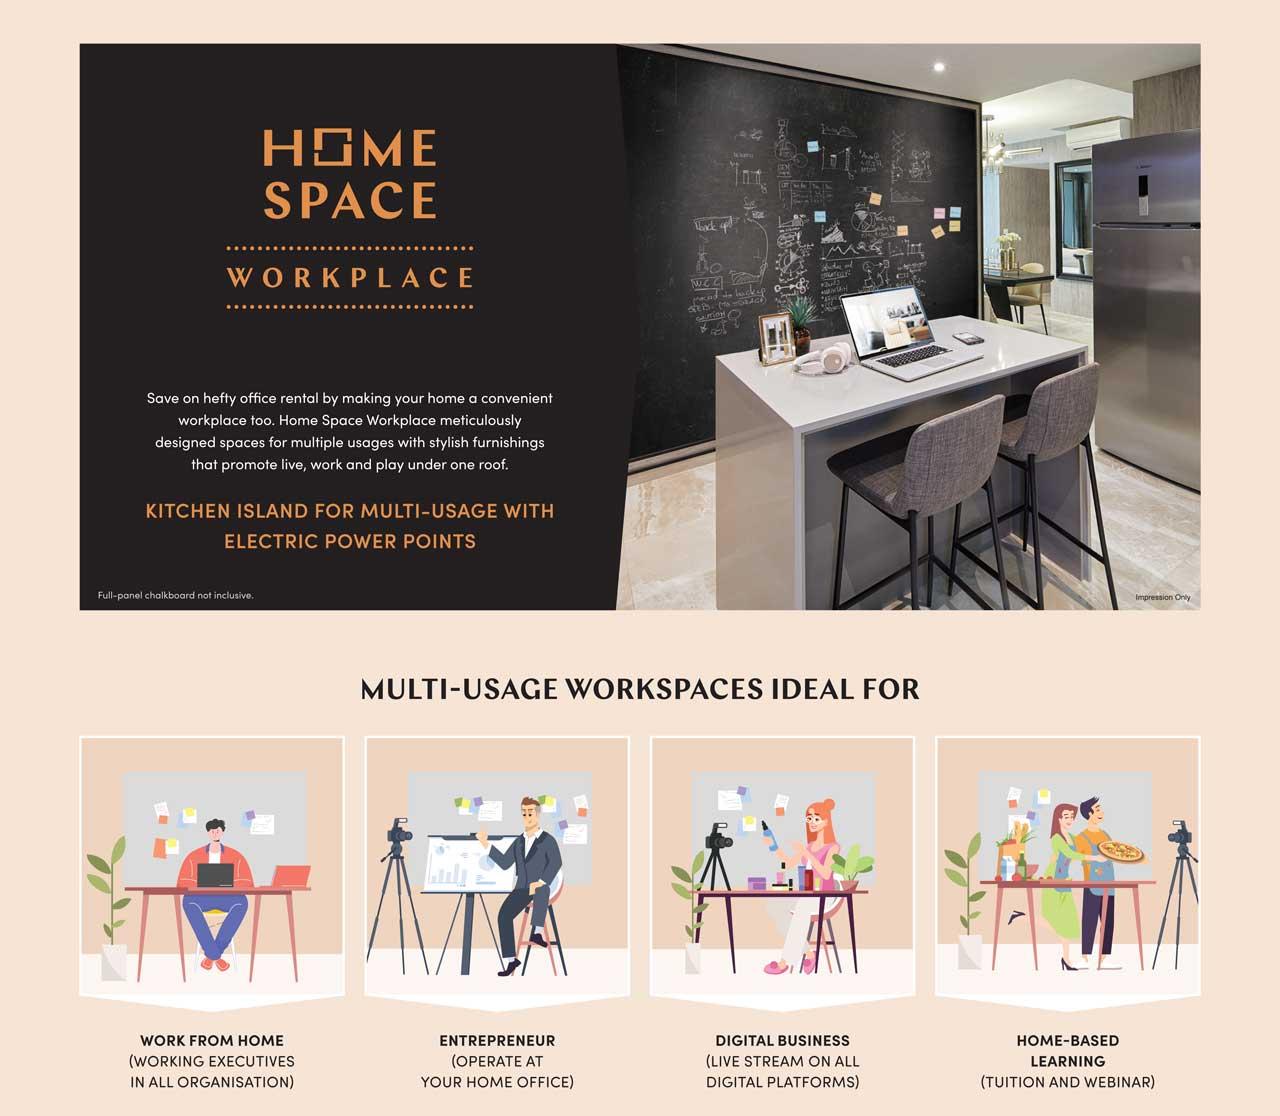 affinity at serangoon home spcae workplace